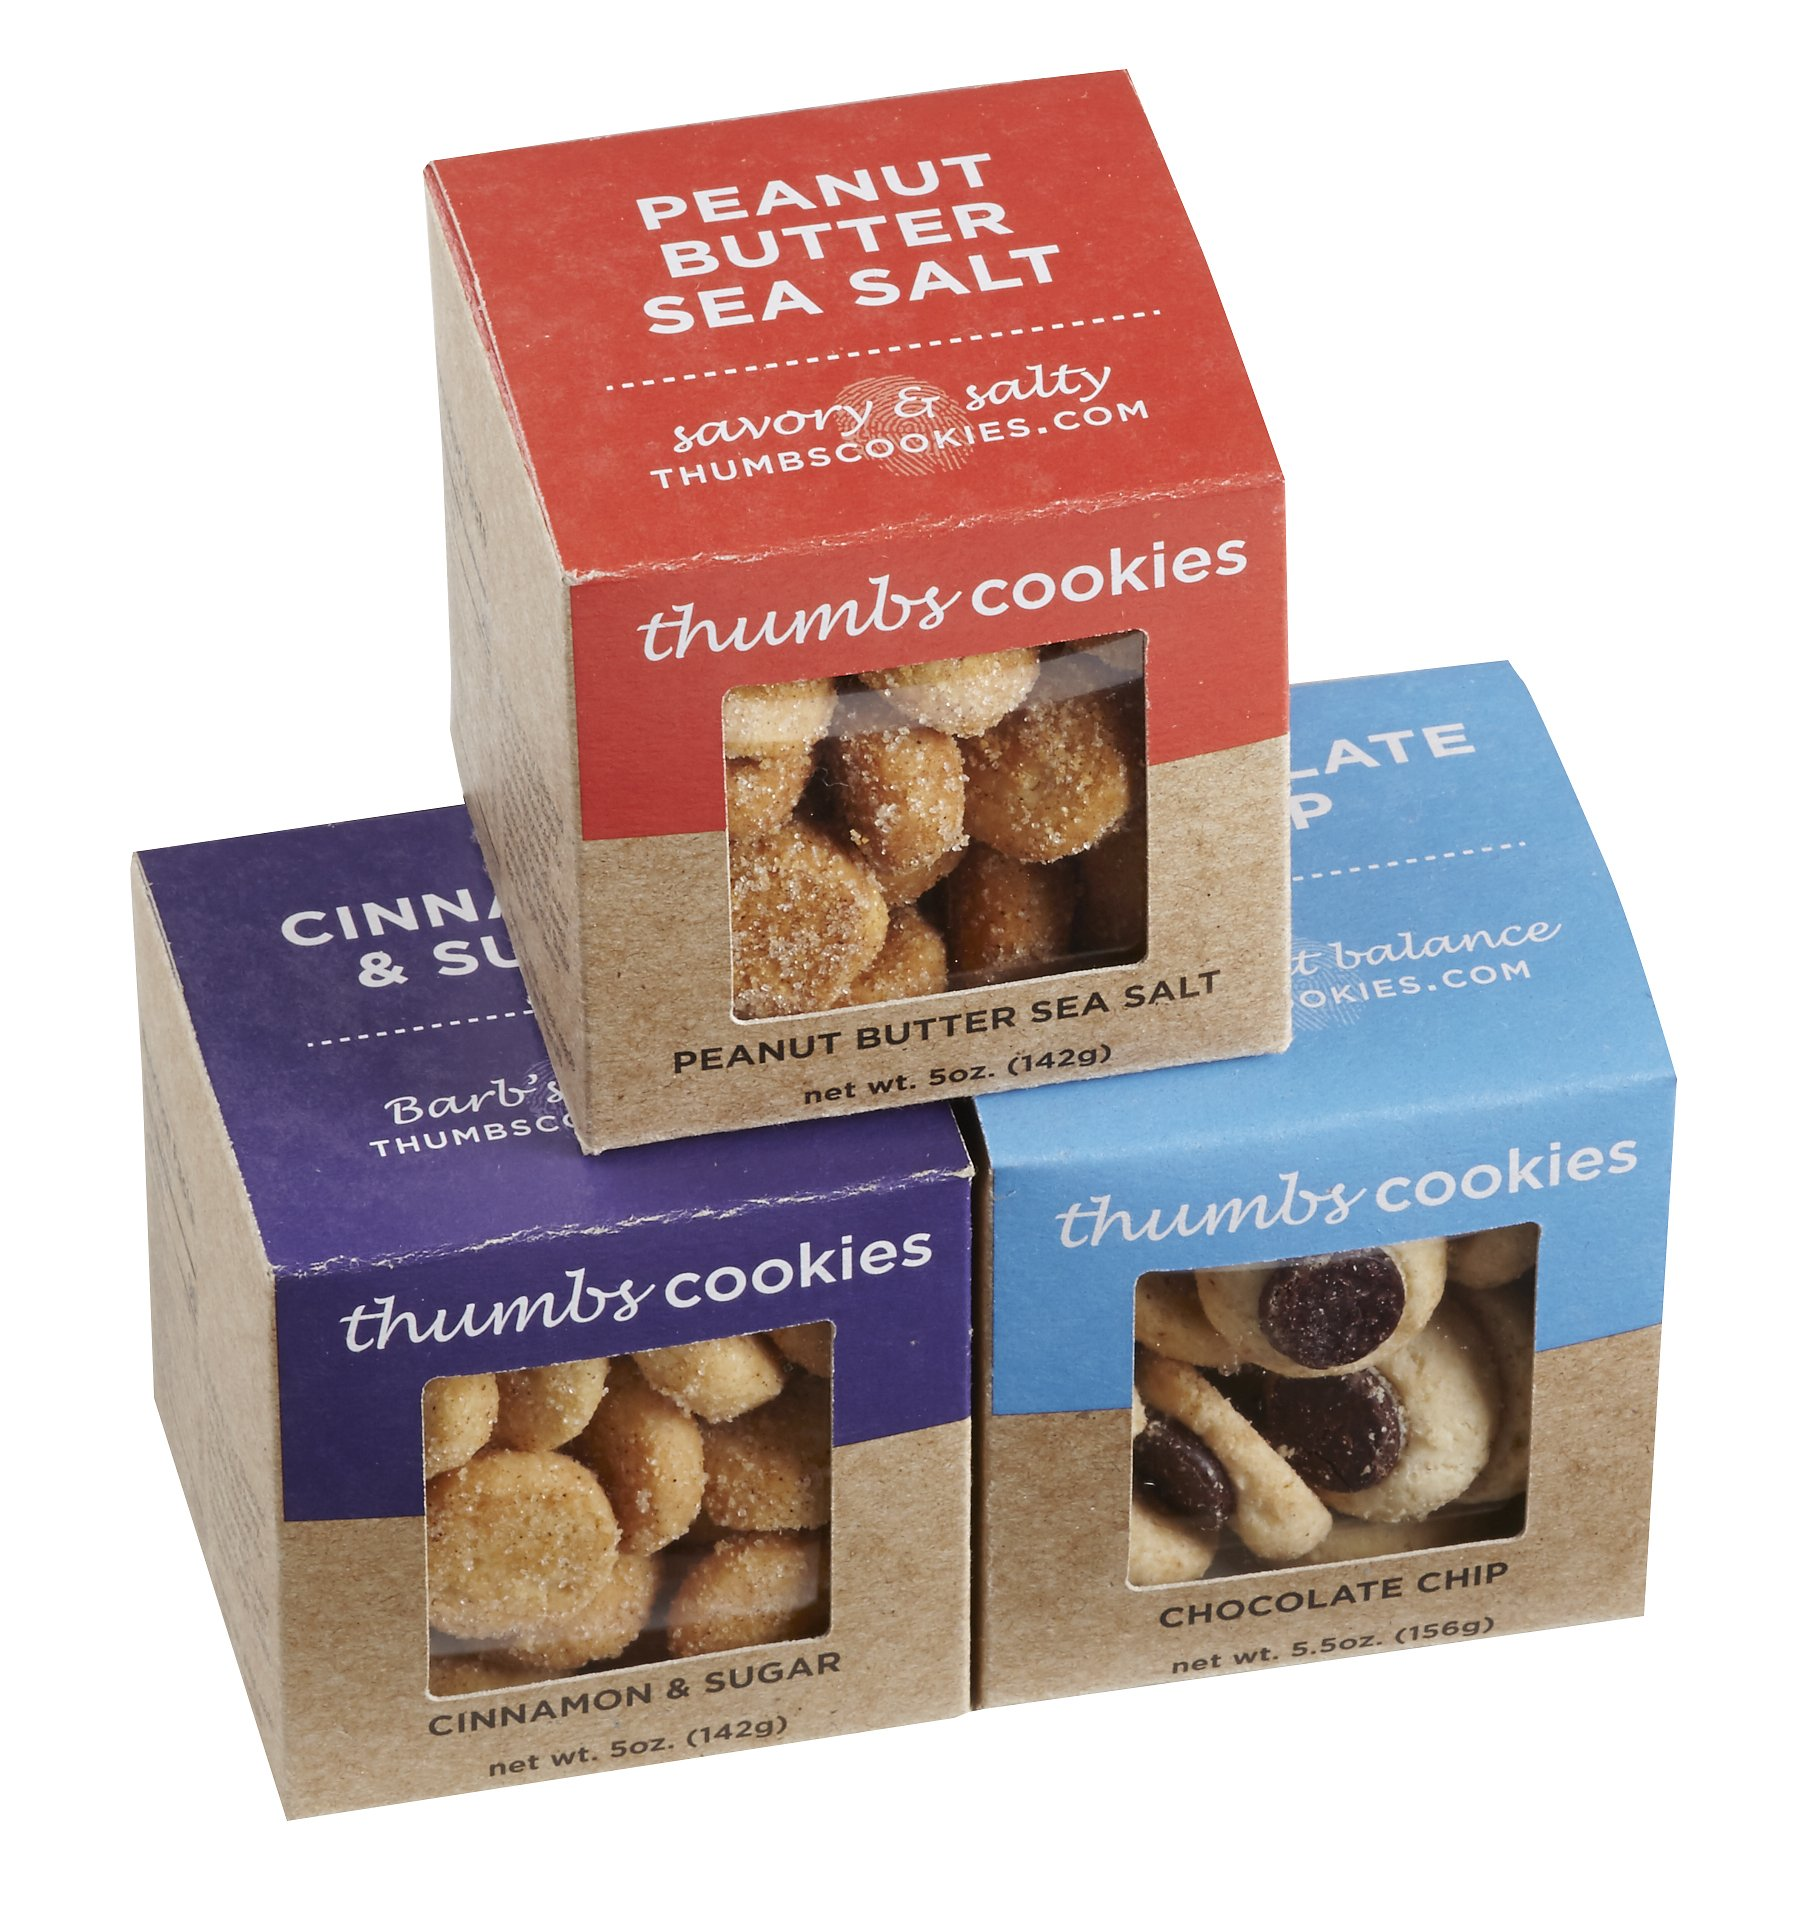 Thumbs Cookies Variety Pack of Fresh Baked Cookies in 3 Boxes - Chocolate Chip Cookies, Cinnamon Sugar Cookies, and Peanut Butter Sea Salt Cookies - 1 lb. Cookie Gift Box by Thumbs Cookies